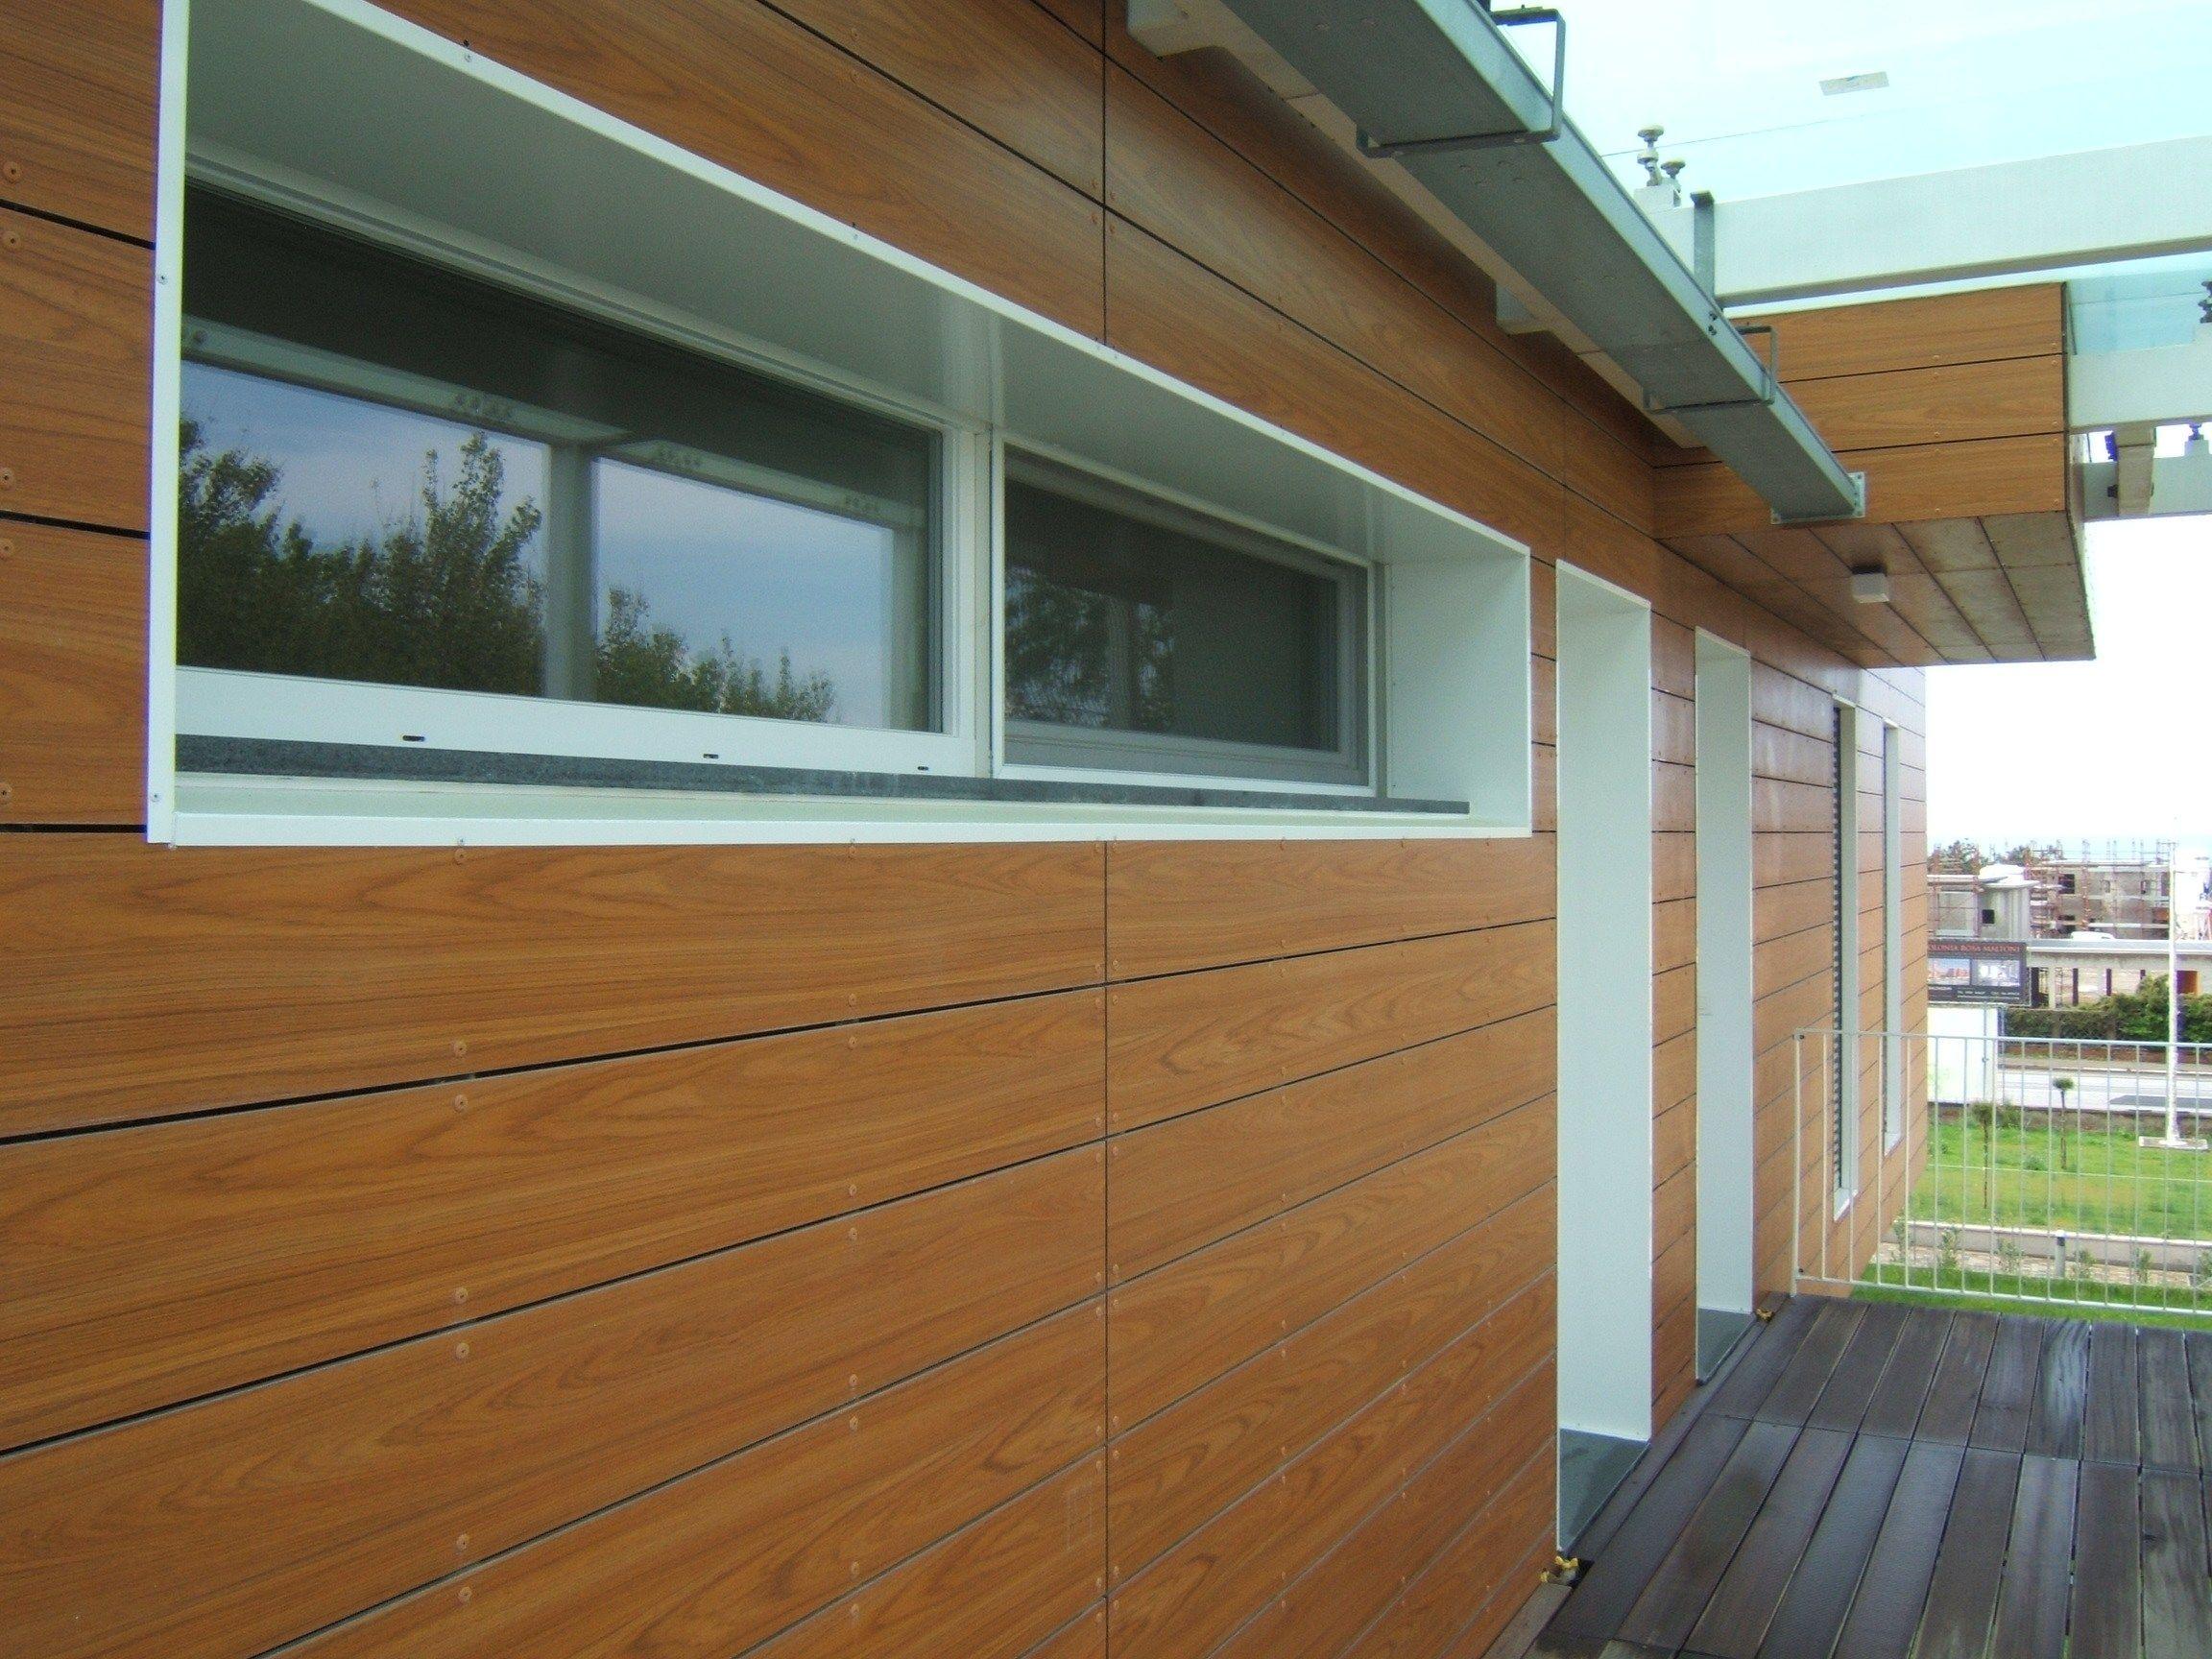 lastra di rivestimento in laminato plastico opaco fundermax exterior by kalikos. Black Bedroom Furniture Sets. Home Design Ideas